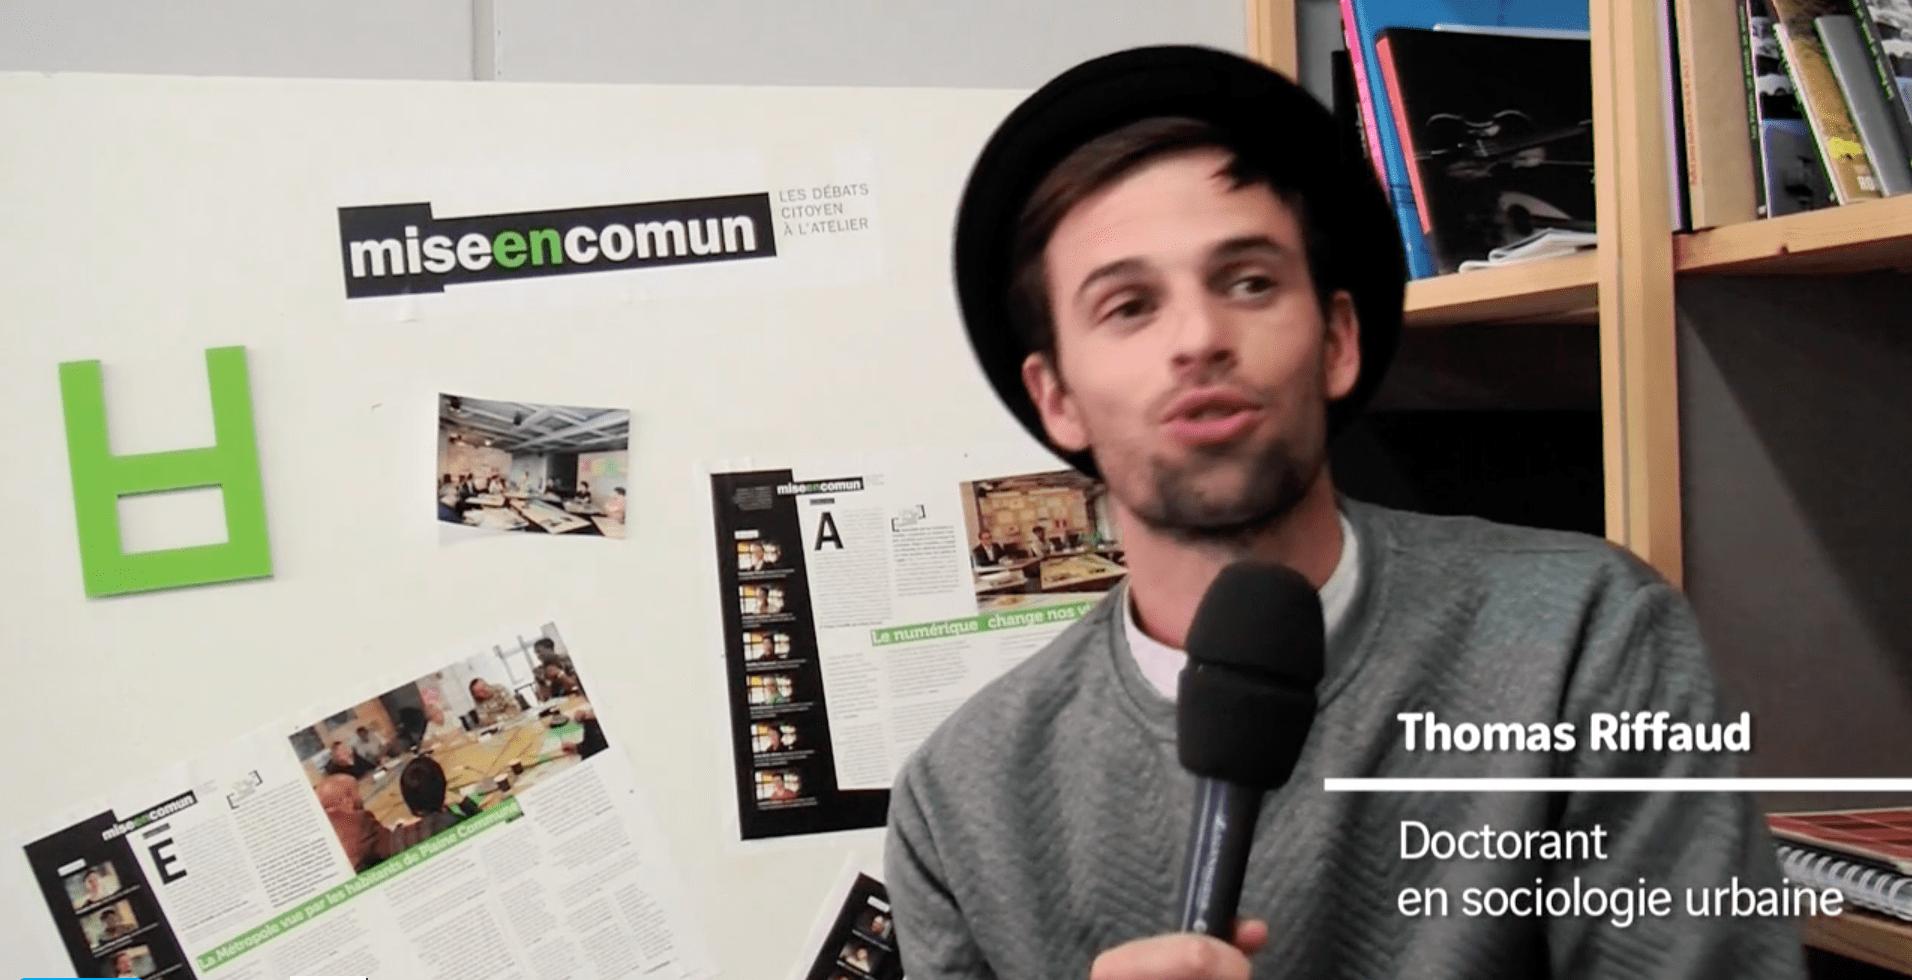 Le futur des espaces publics - Thomas Riffaud, doctorant en sociologie urbaine